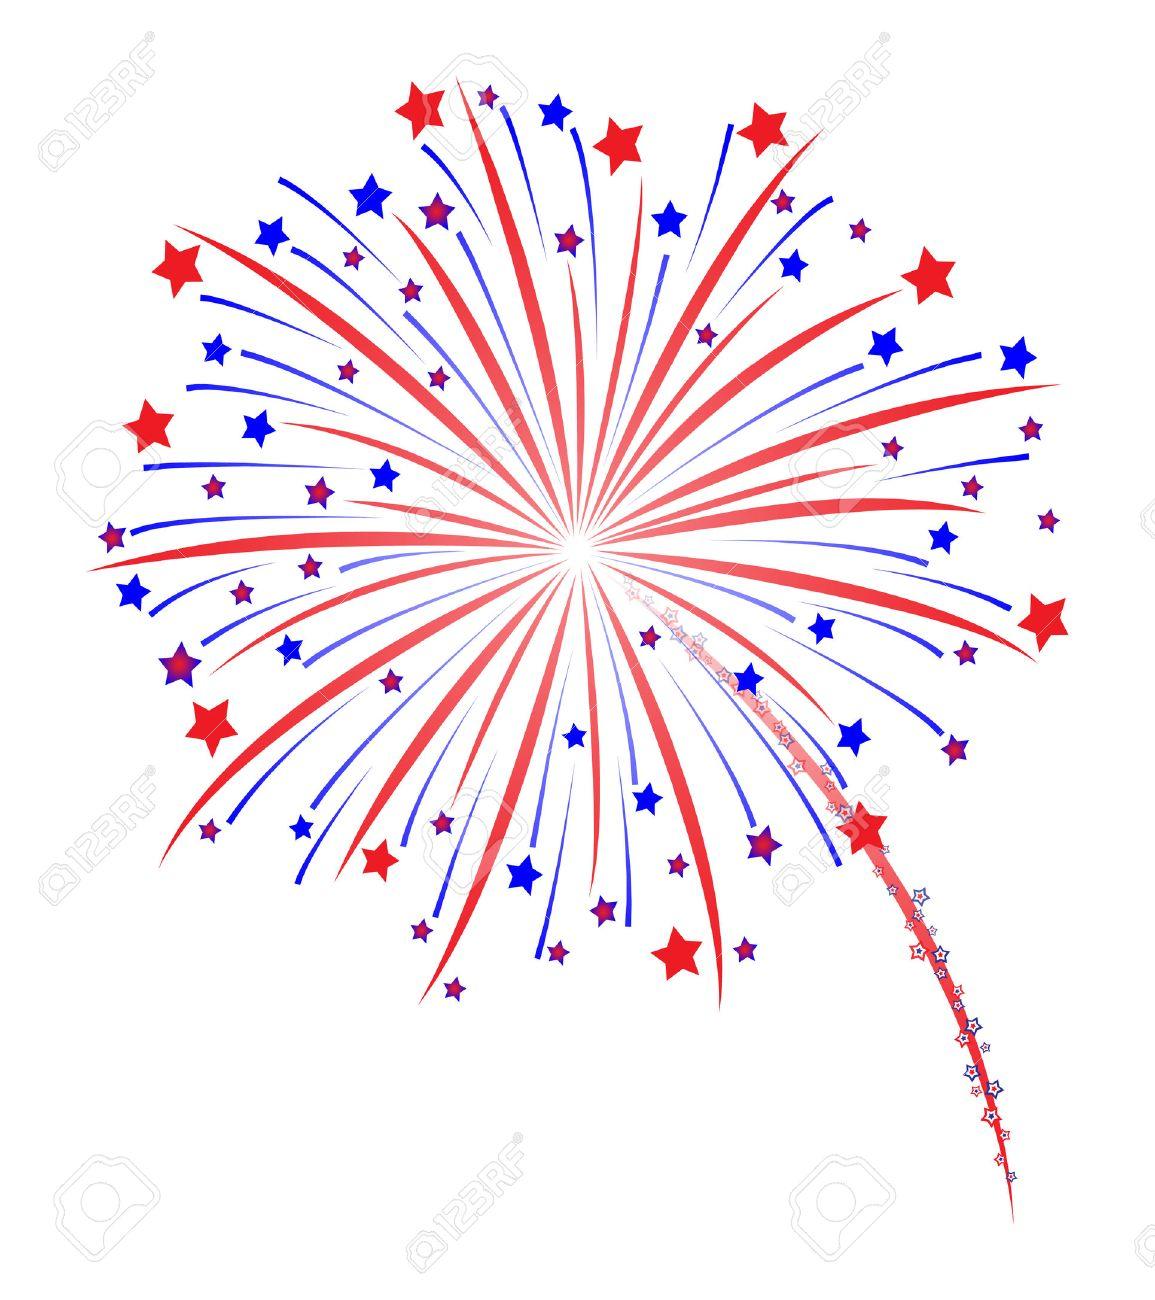 fireworks vector illustration royalty free cliparts vectors and rh 123rf com Fireworks Transparent Background Fireworks Clip Art